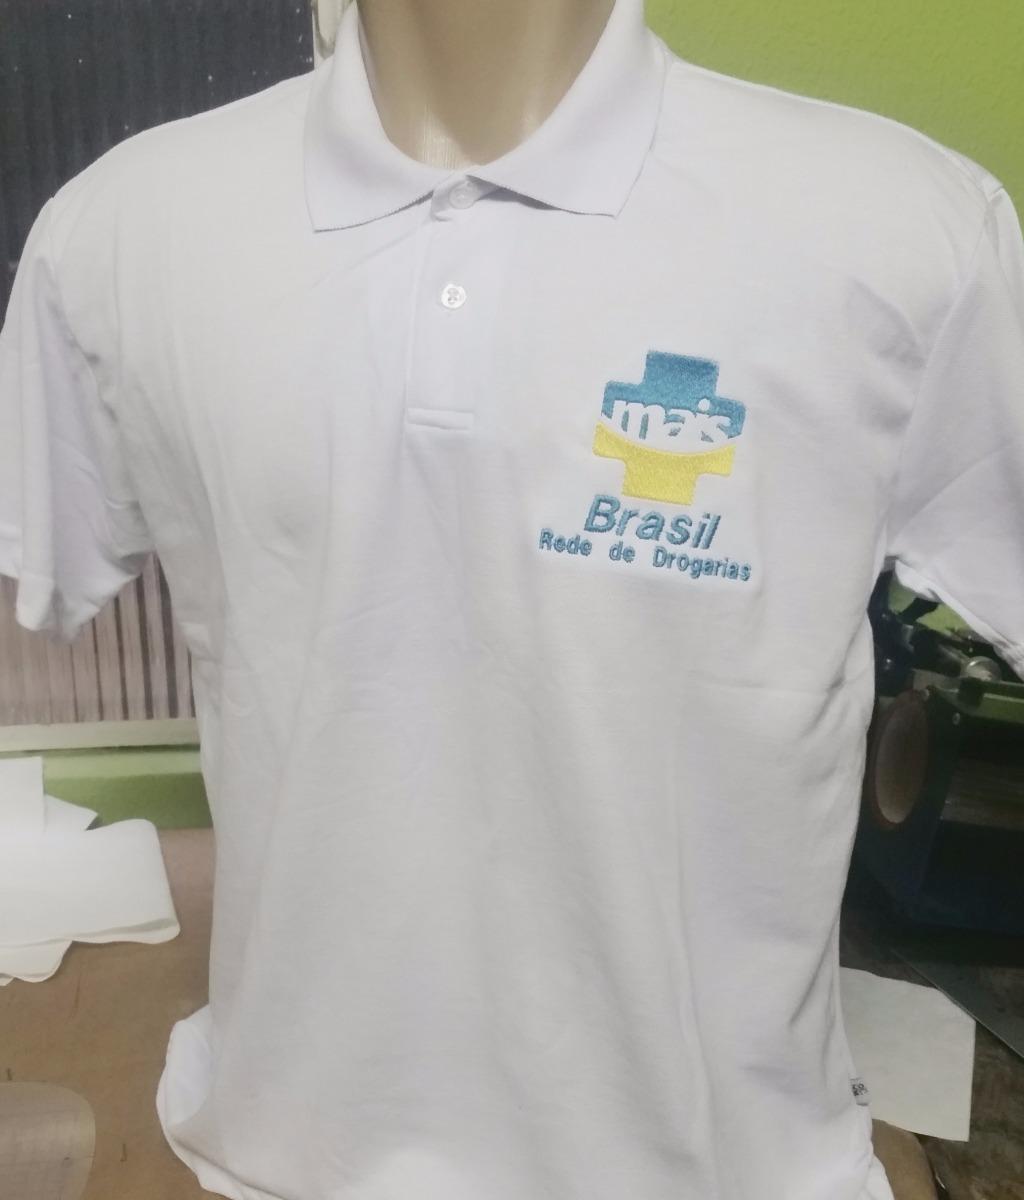 0c1abfacb9 10 camisa polo uniformes bordado personalizado com logotipo. Carregando  zoom.